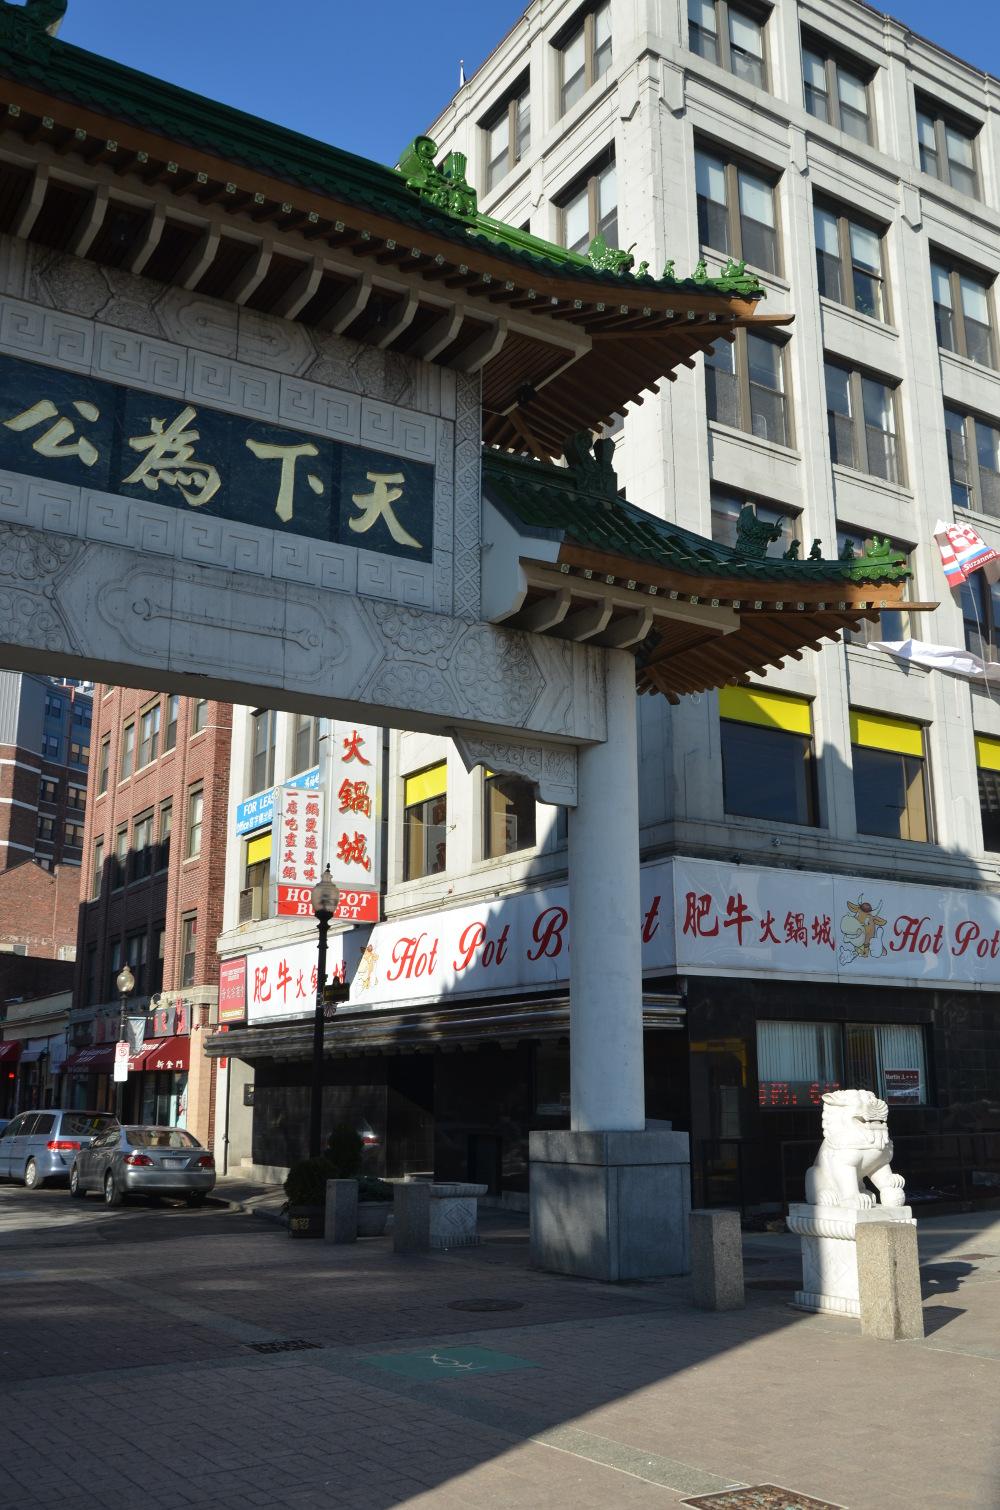 3a chinatown gate